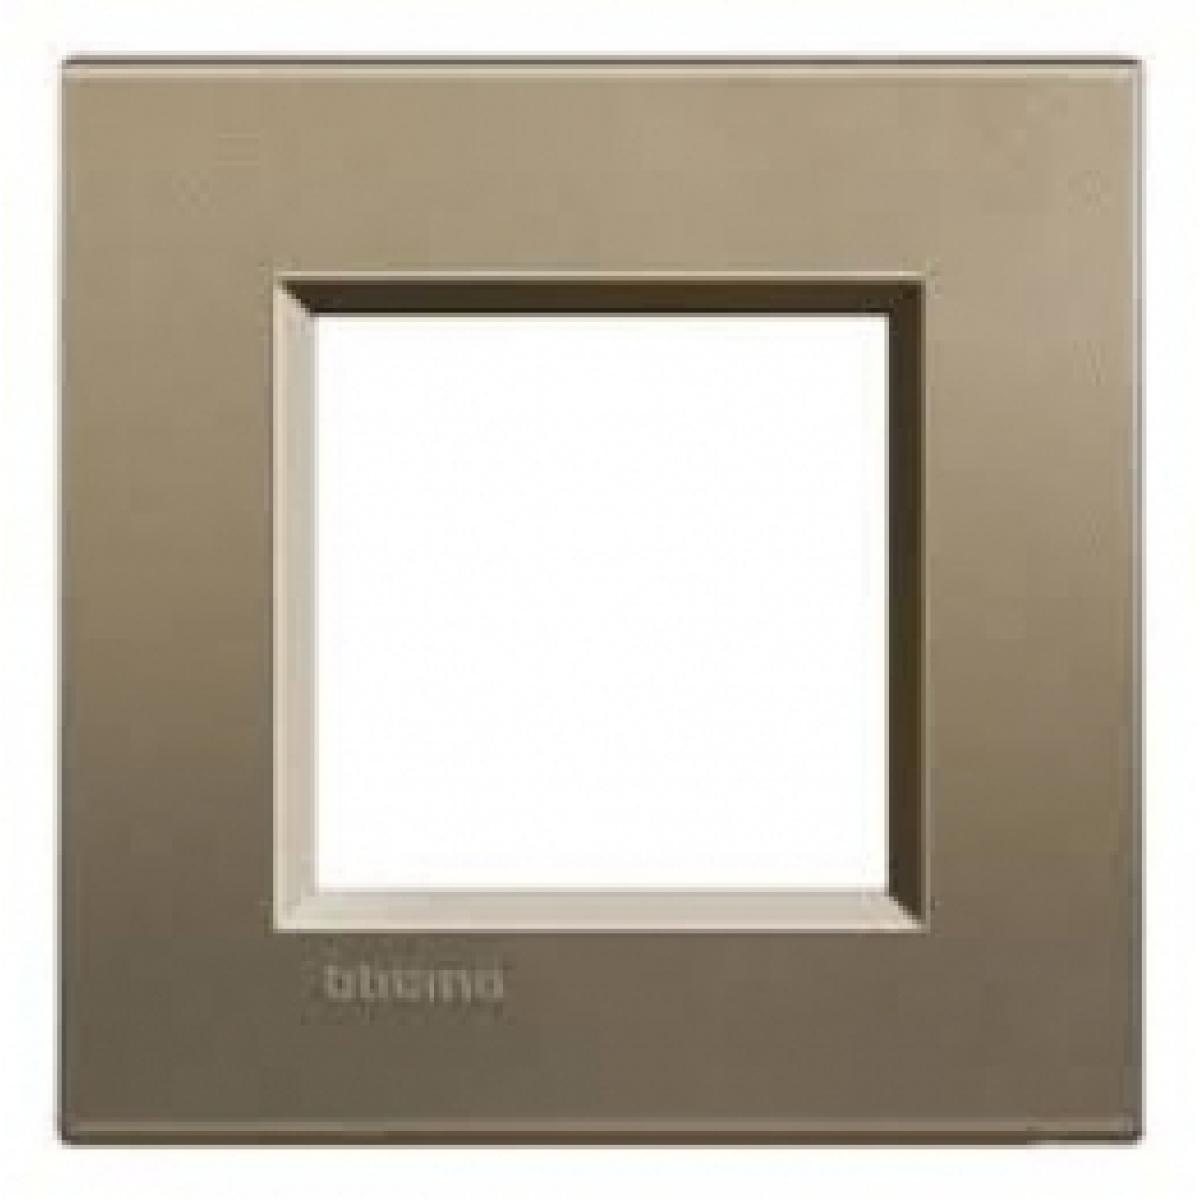 Placca 2 Moduli Square Bticino Living International LNA4802SQ